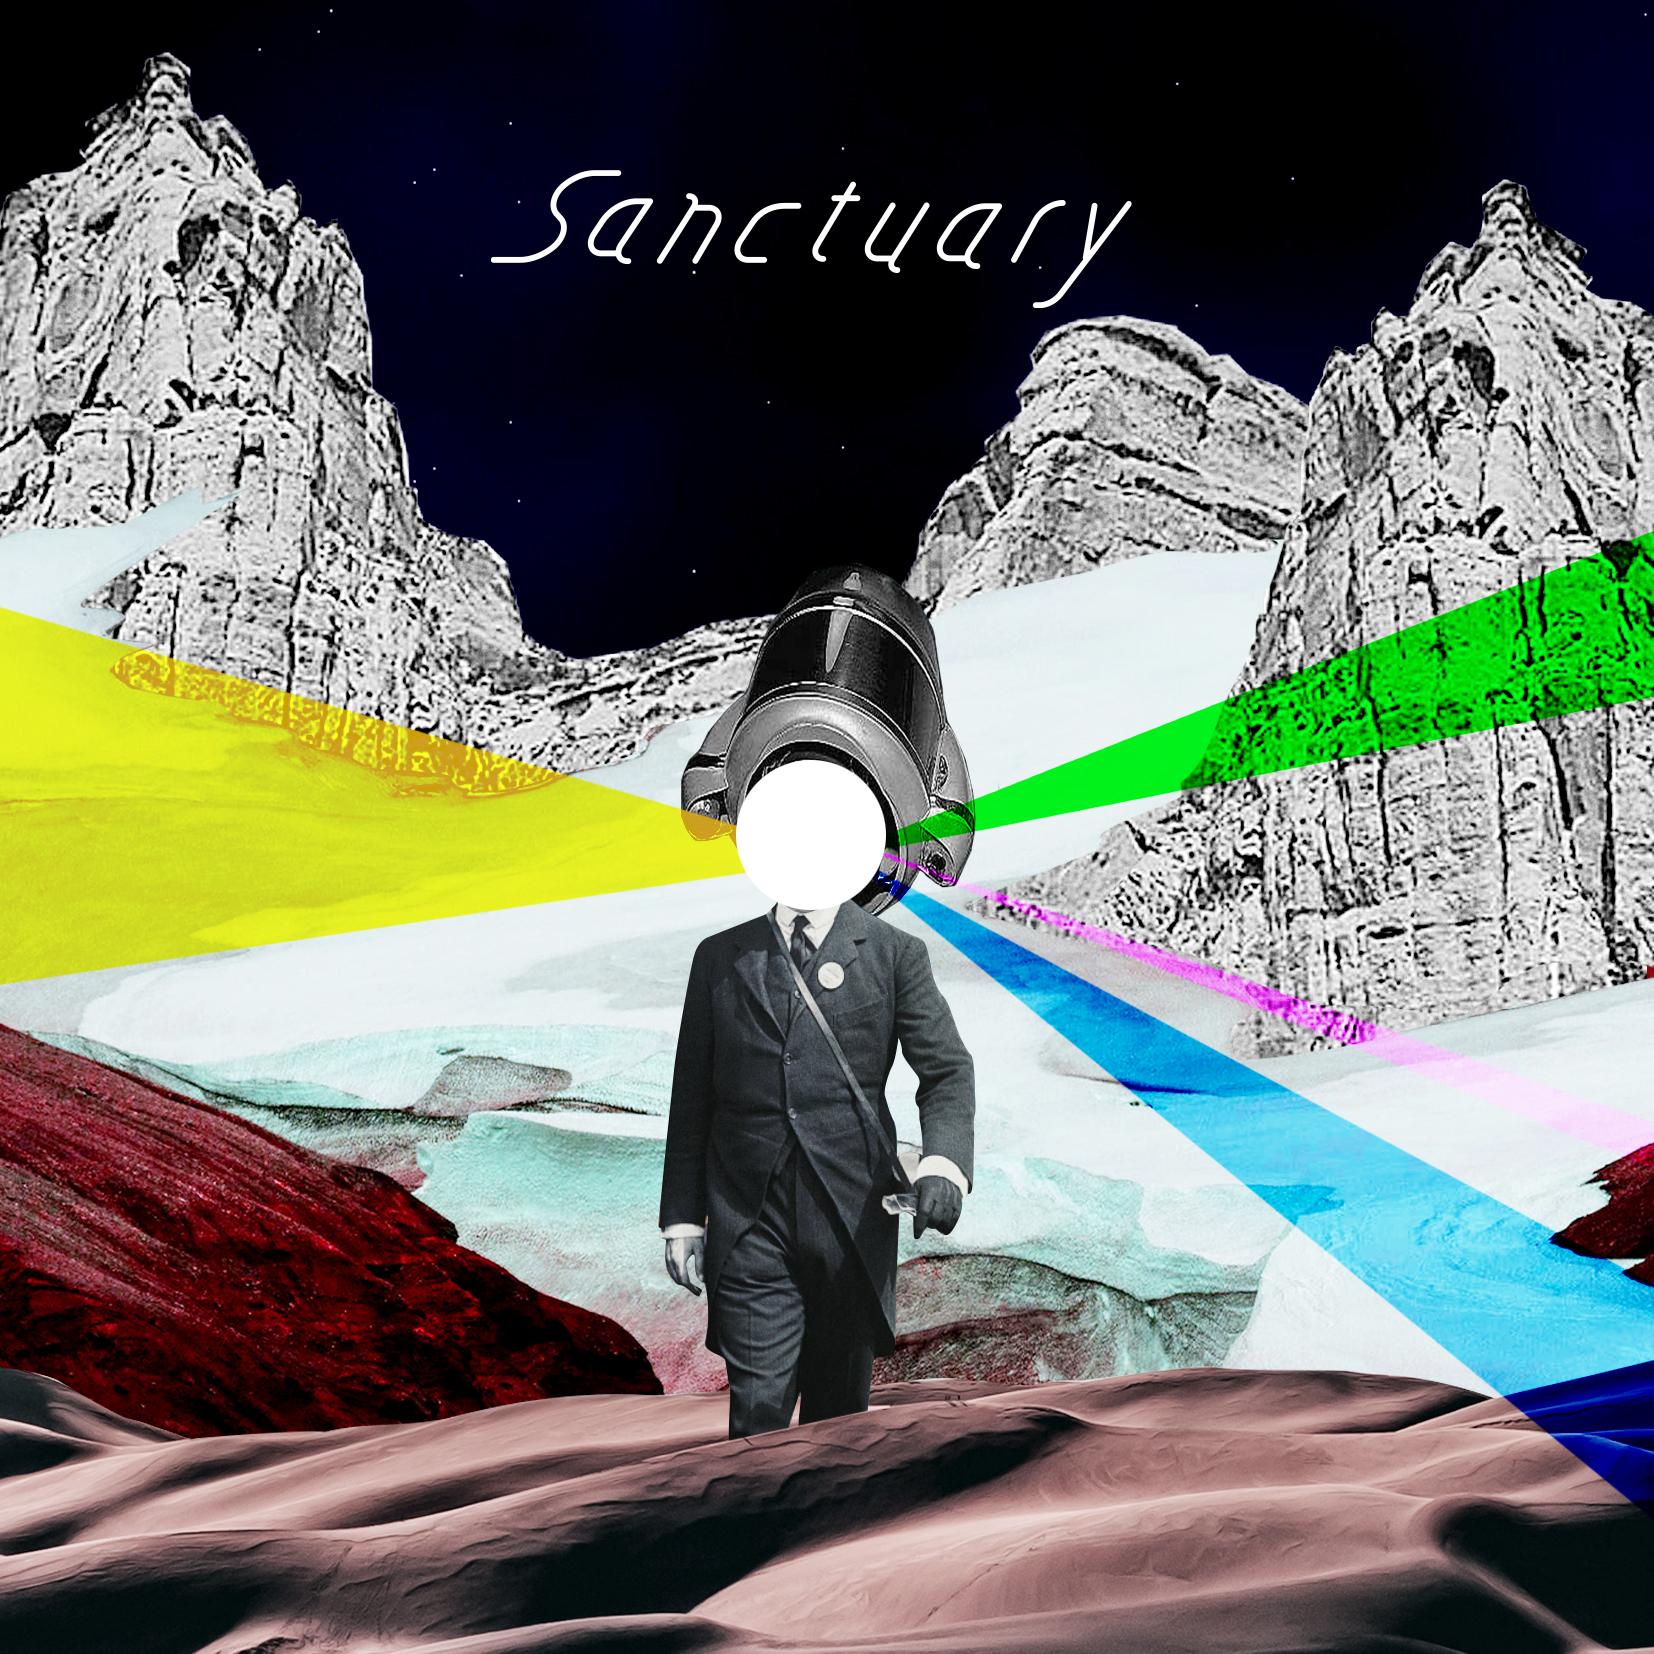 Sanctuary初回限定盤